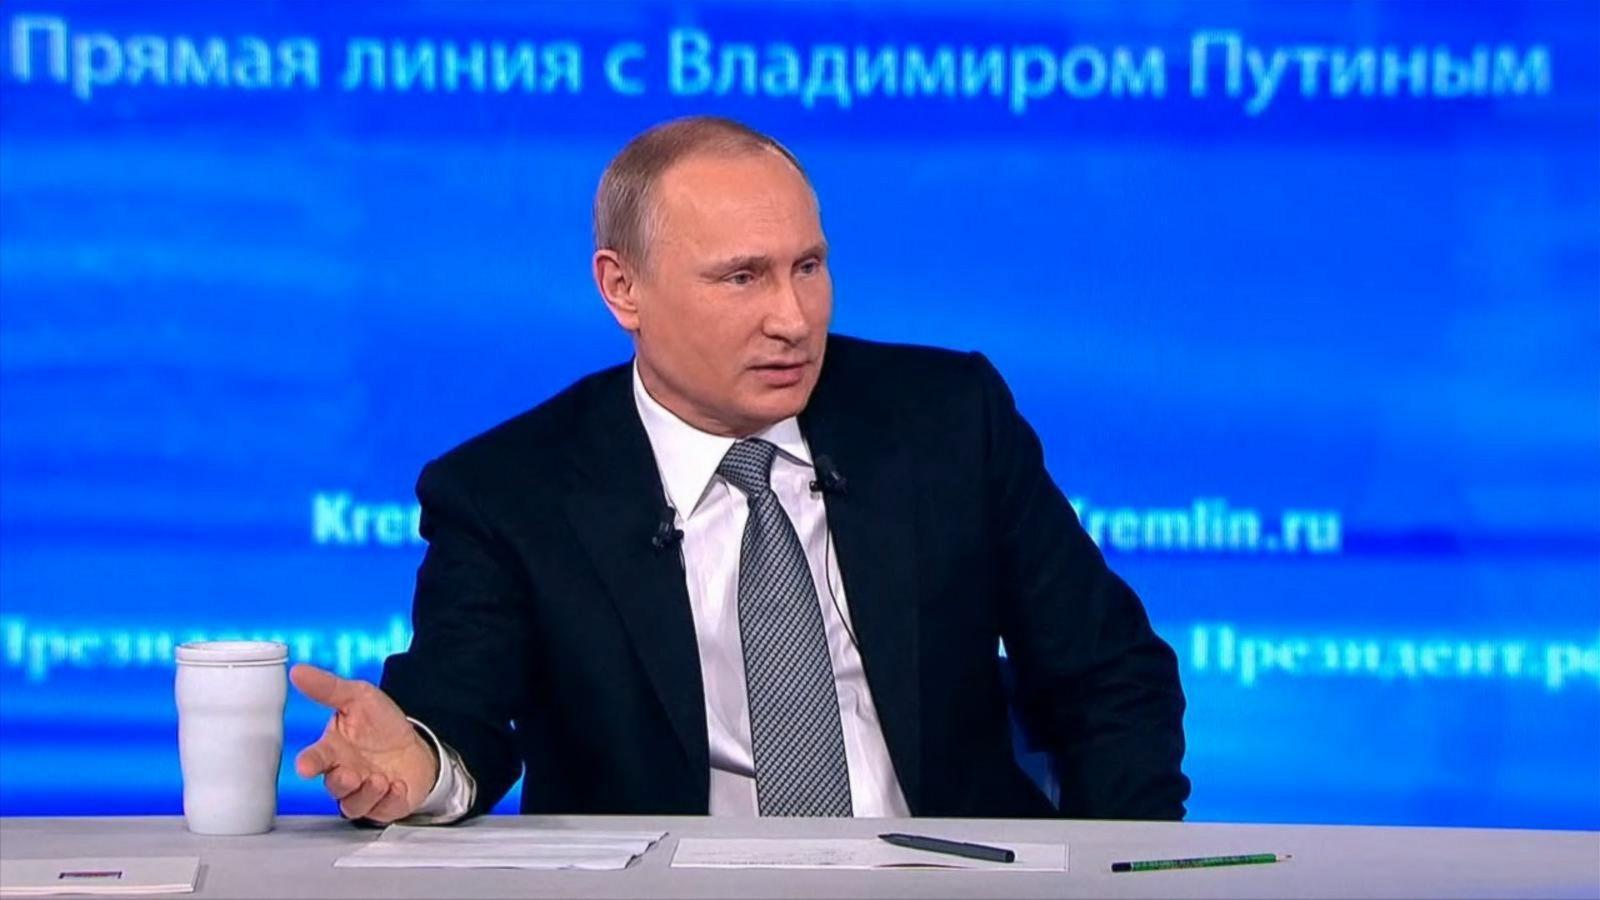 Vladimir Putin Heaps Praise on Obama, but Dodges on Clinton vs ...